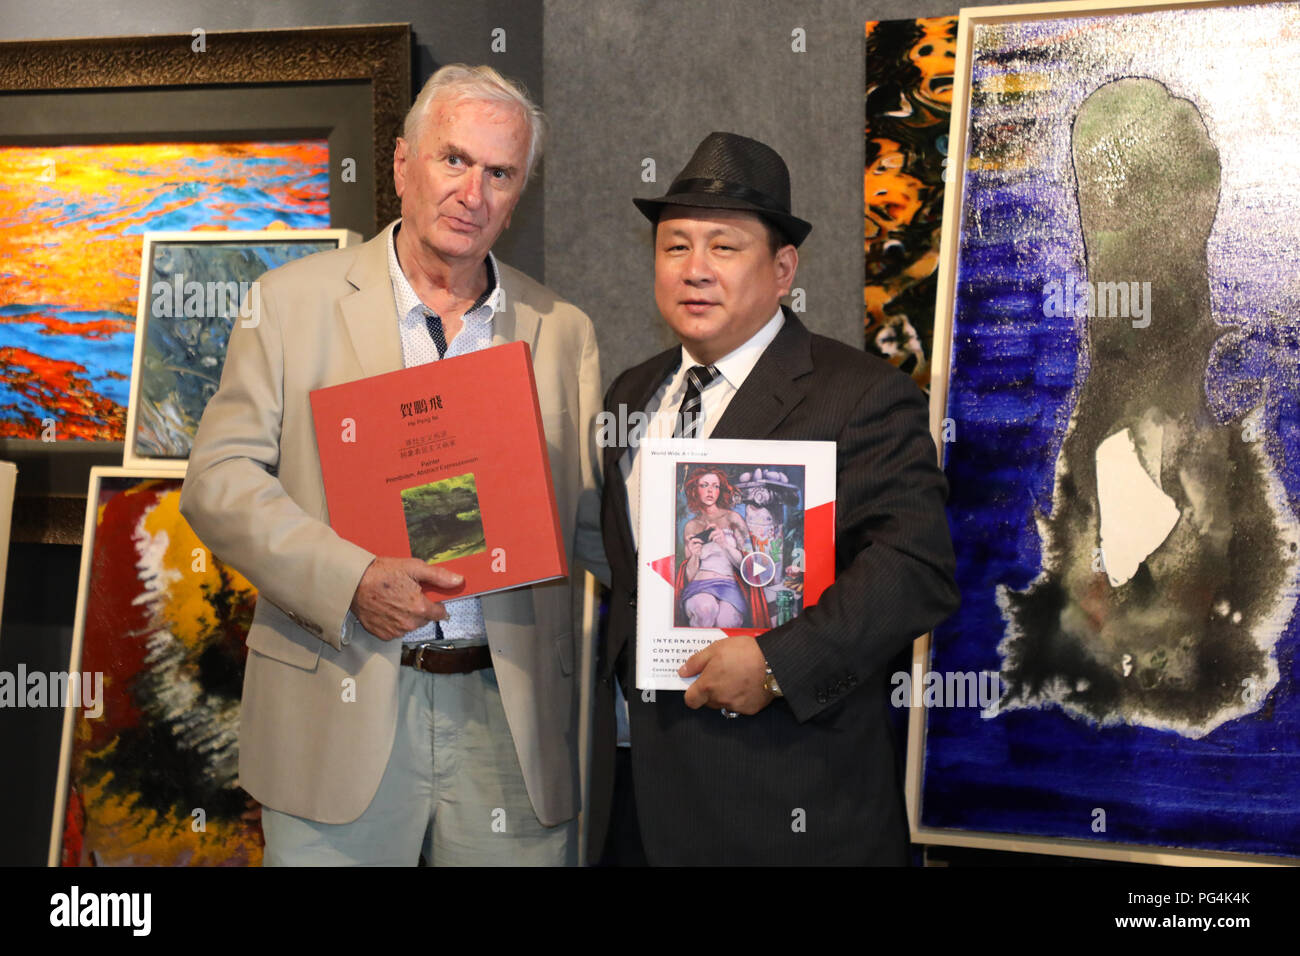 Artist Exhibition: Pengfei He at Ning Zhou Gallery in Laguna Beach